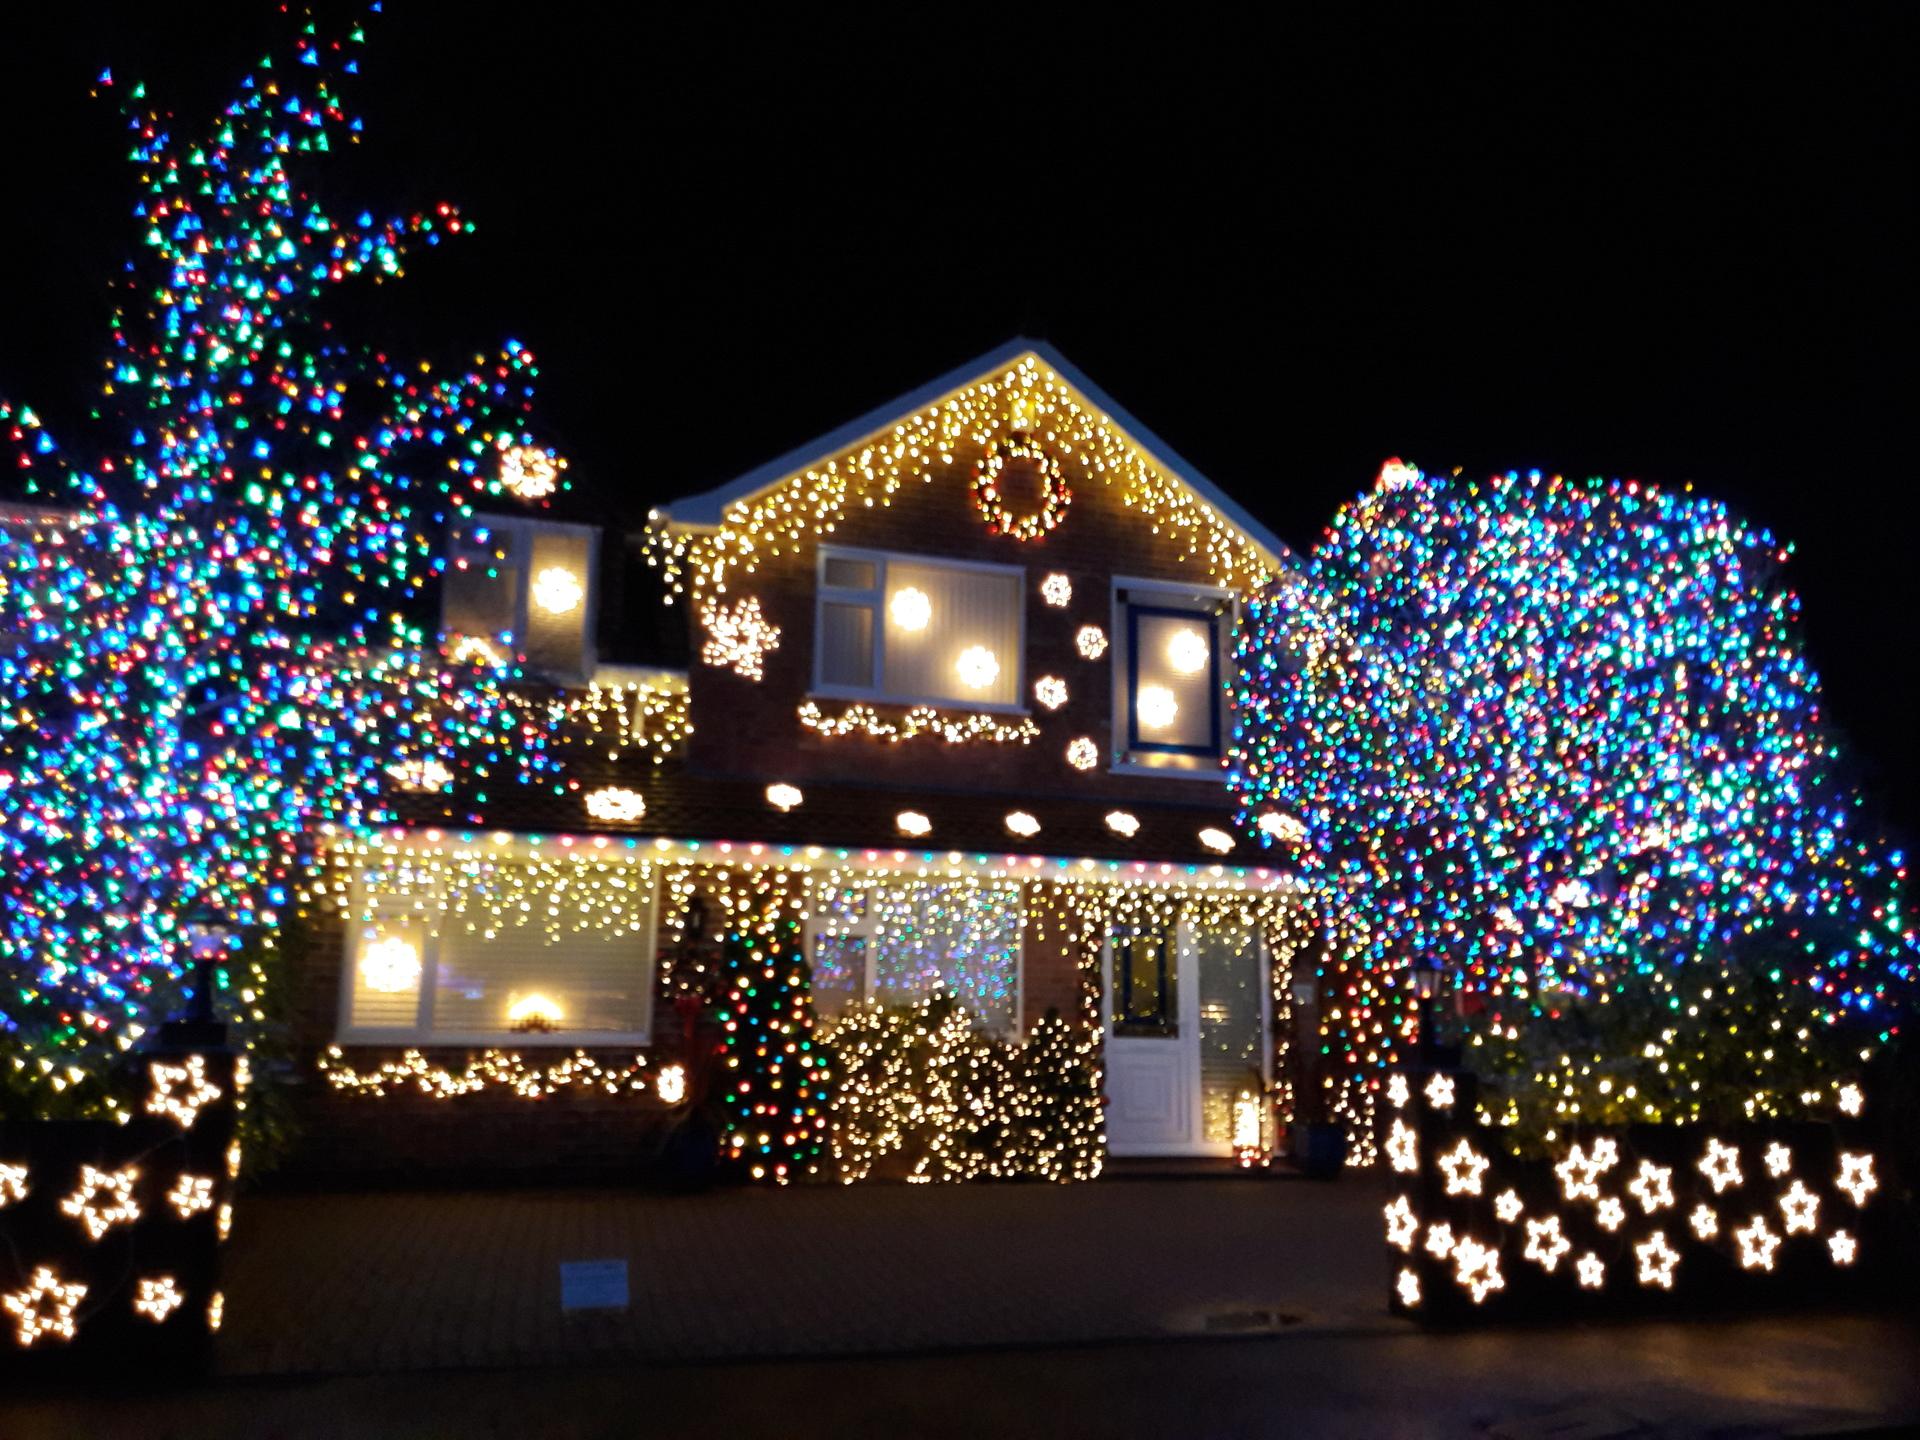 Festive House | dorismay, Christmas, illuminated, light